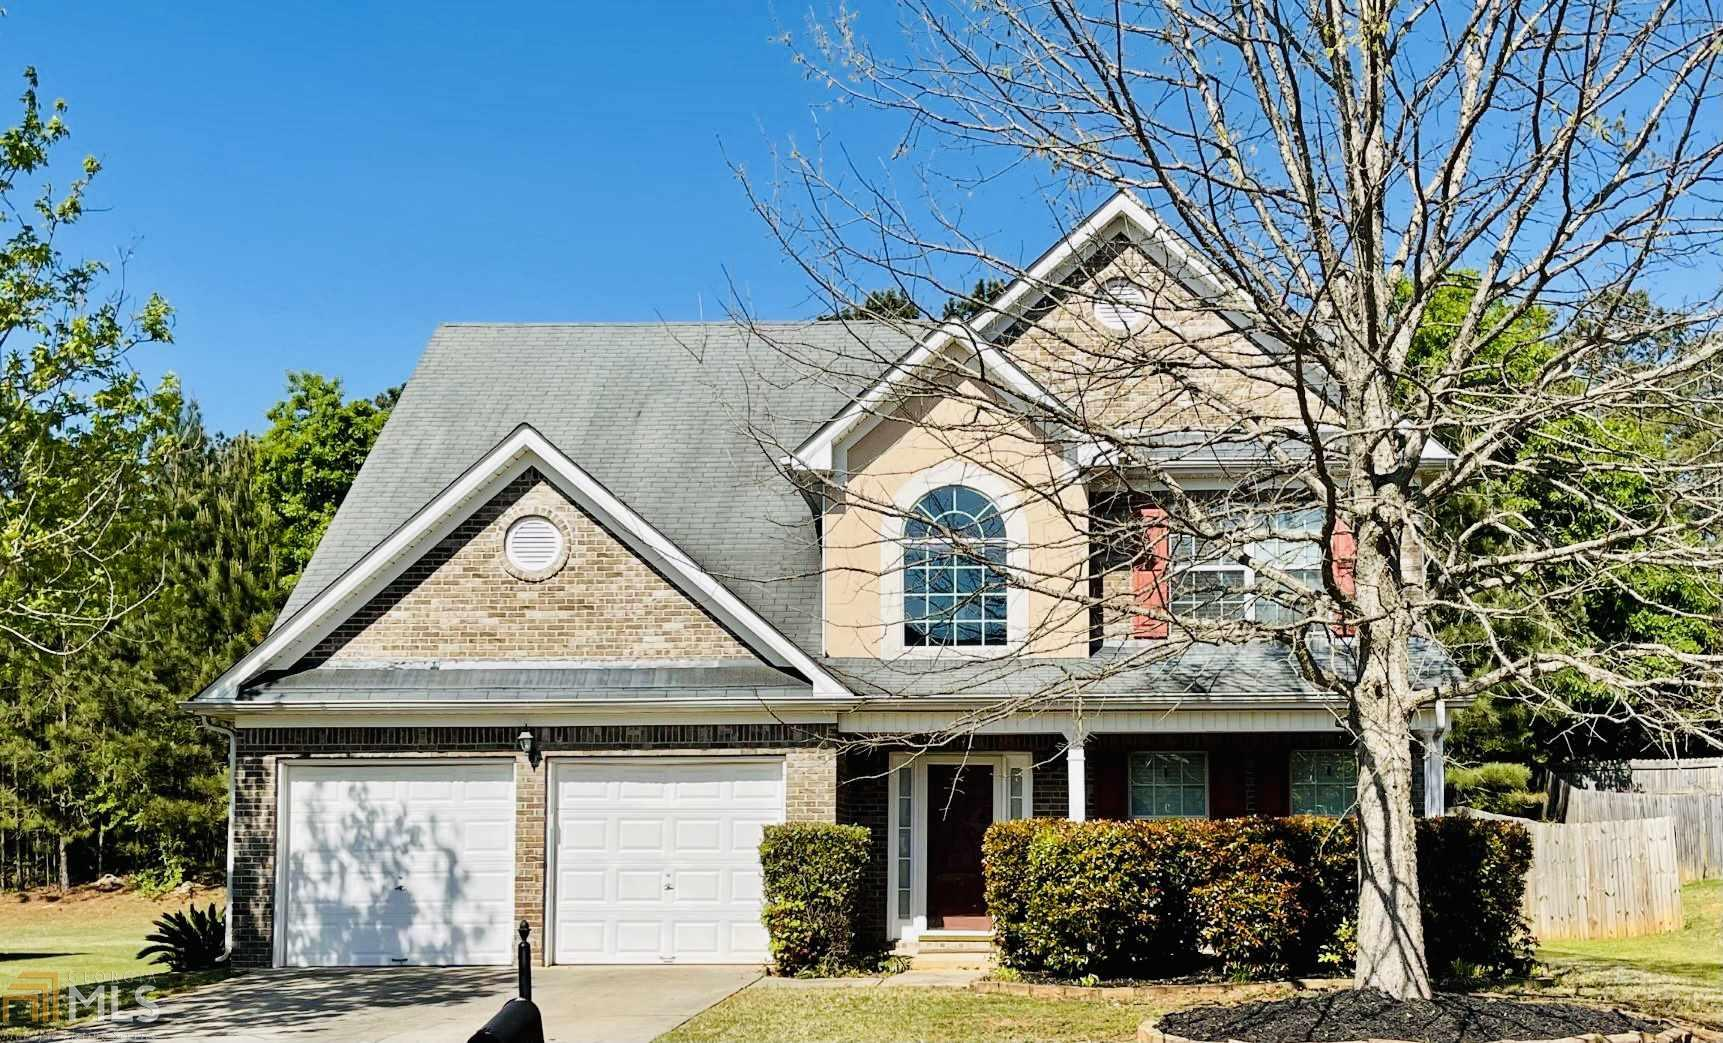 1215 Polk, McDonough, Georgia 30252, 4 Bedrooms Bedrooms, ,3 BathroomsBathrooms,Single Family,For Sale,1215 Polk,2,8963304